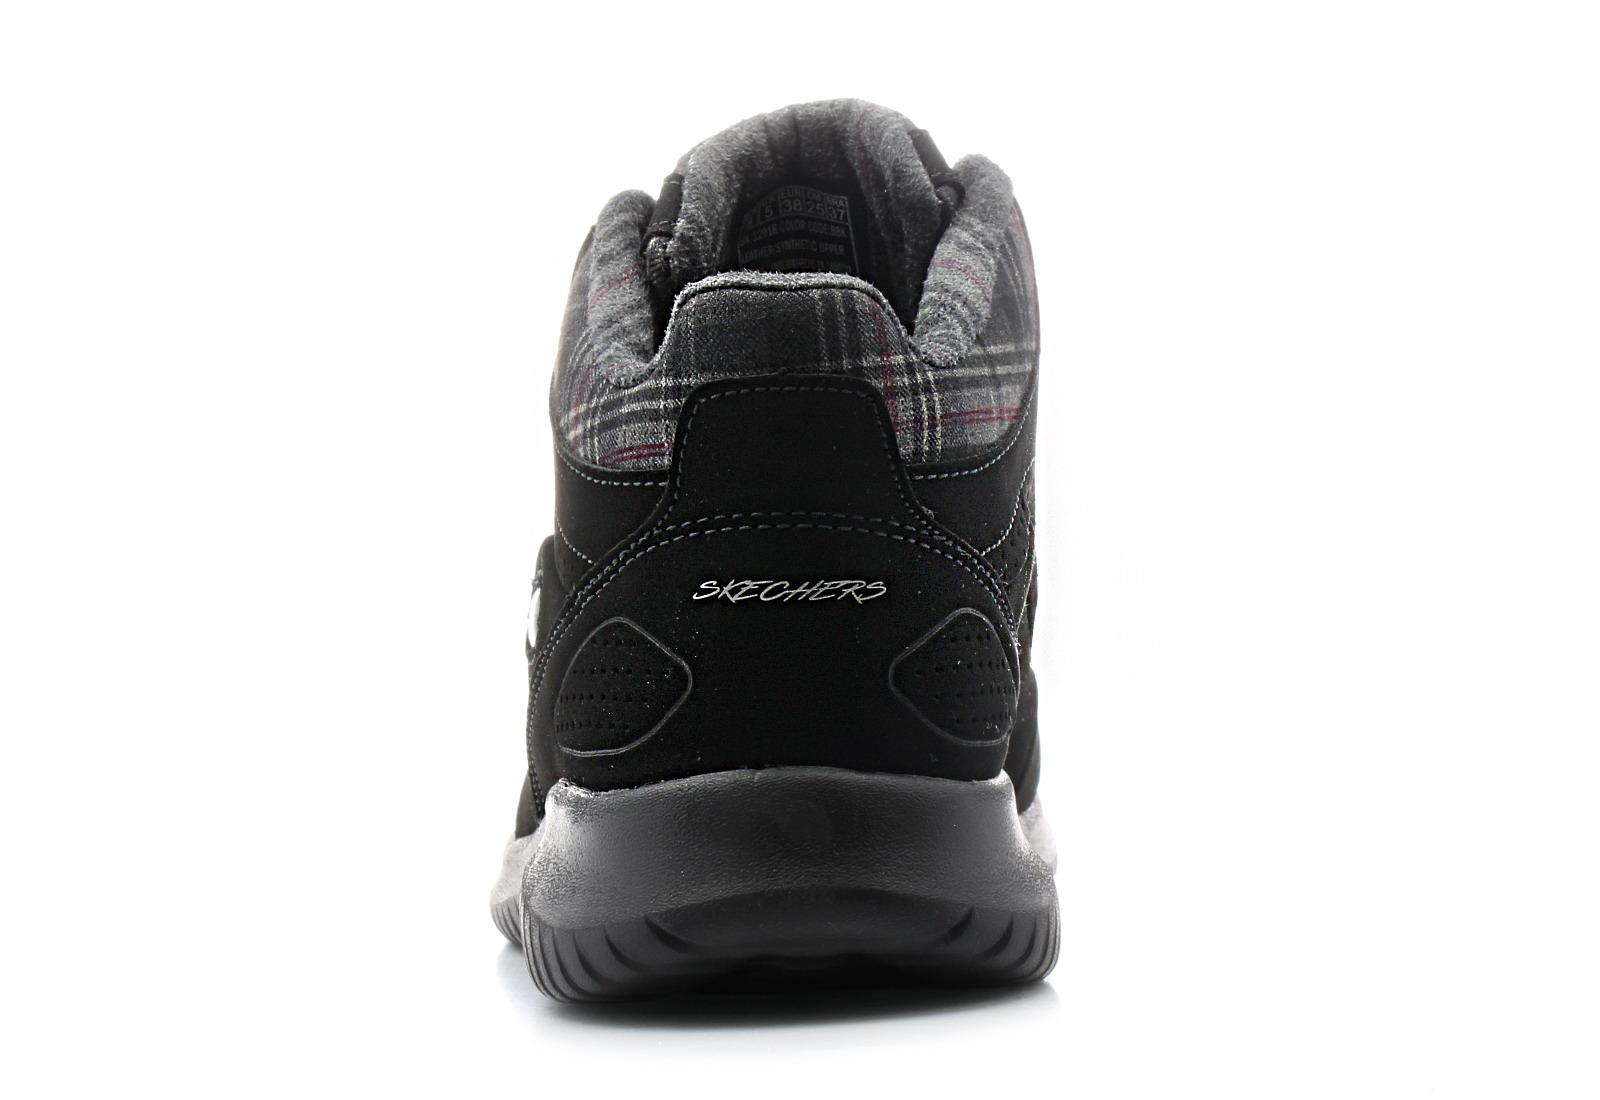 630d213b435 Skechers Topánky - Ultra Flex - Just Chill - 12918-bbk - Tenisky ...